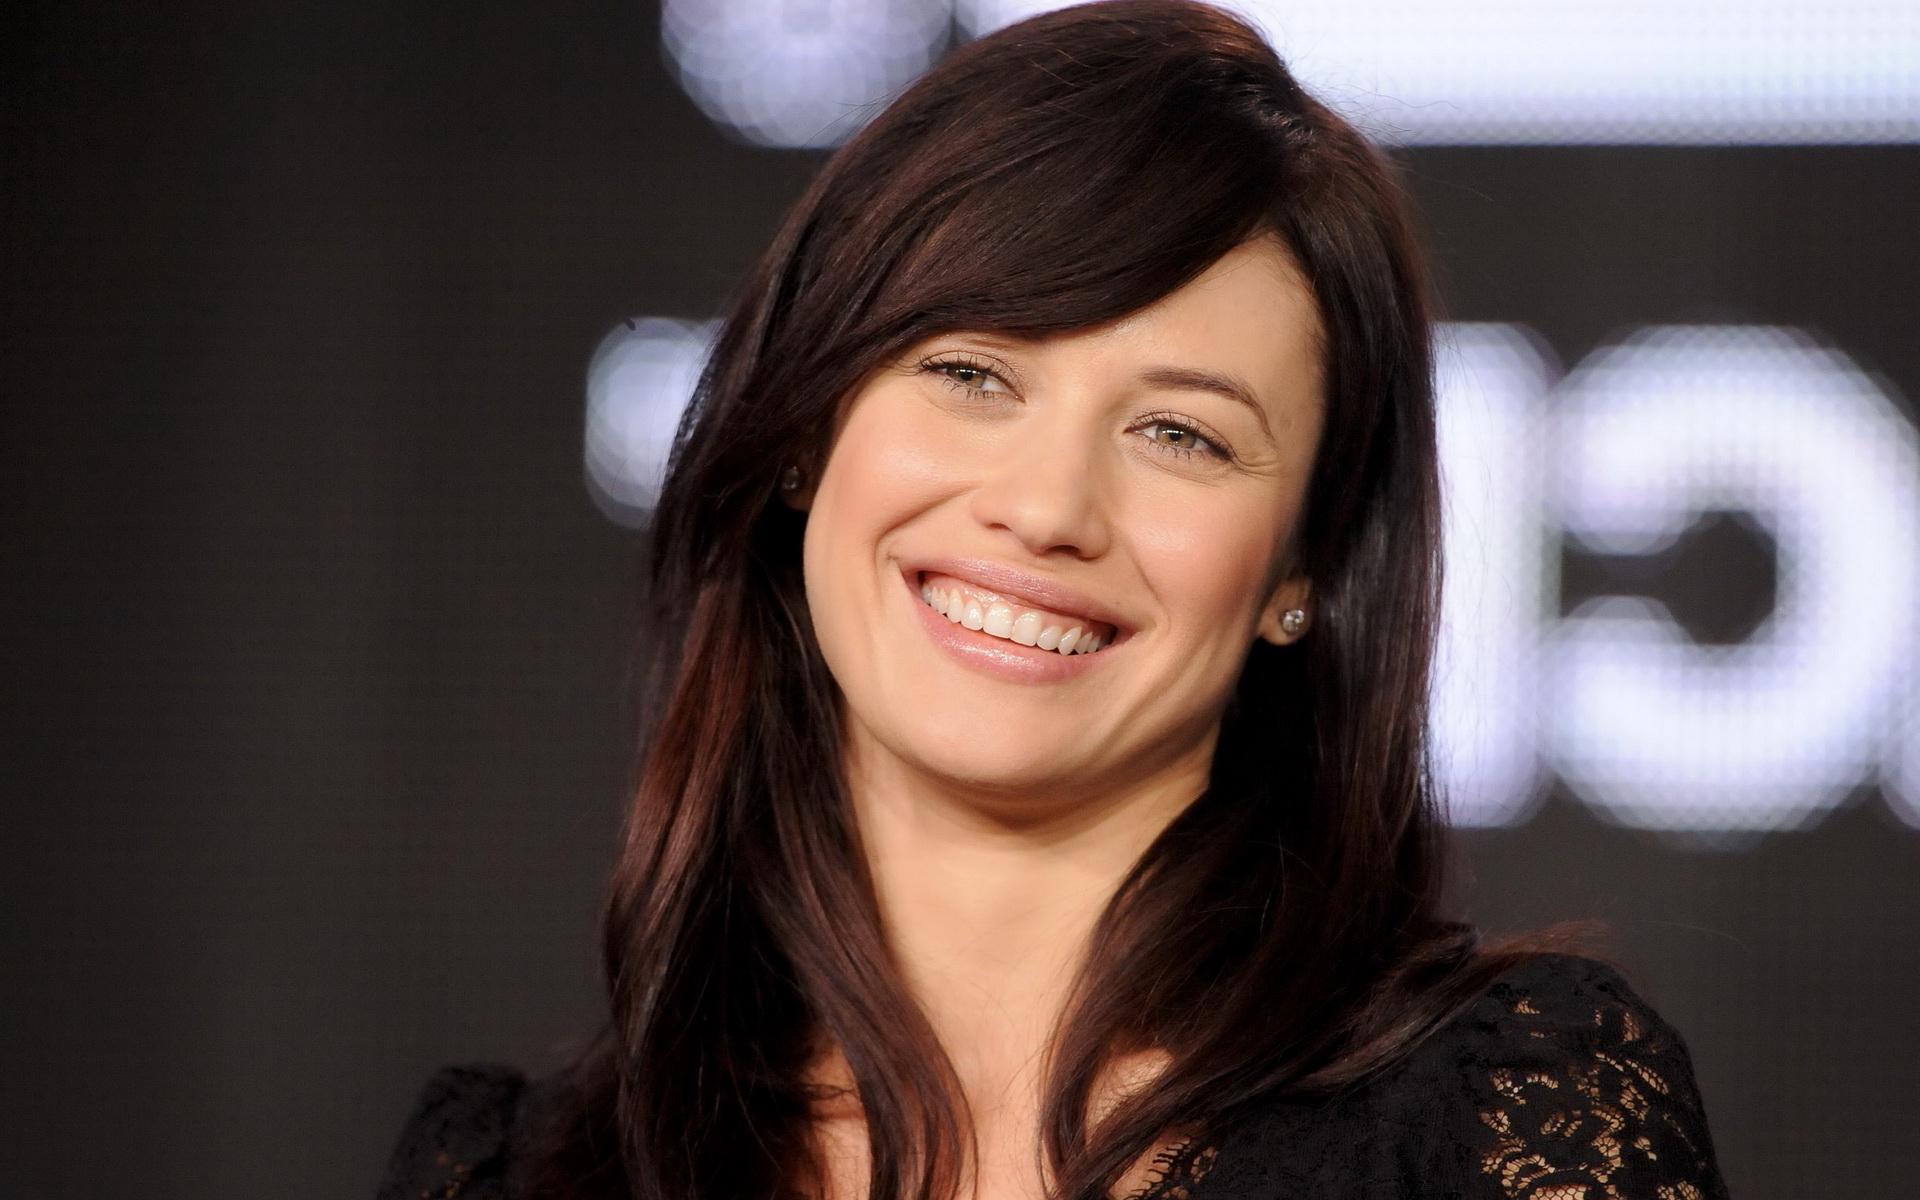 Olga kurylenko smile